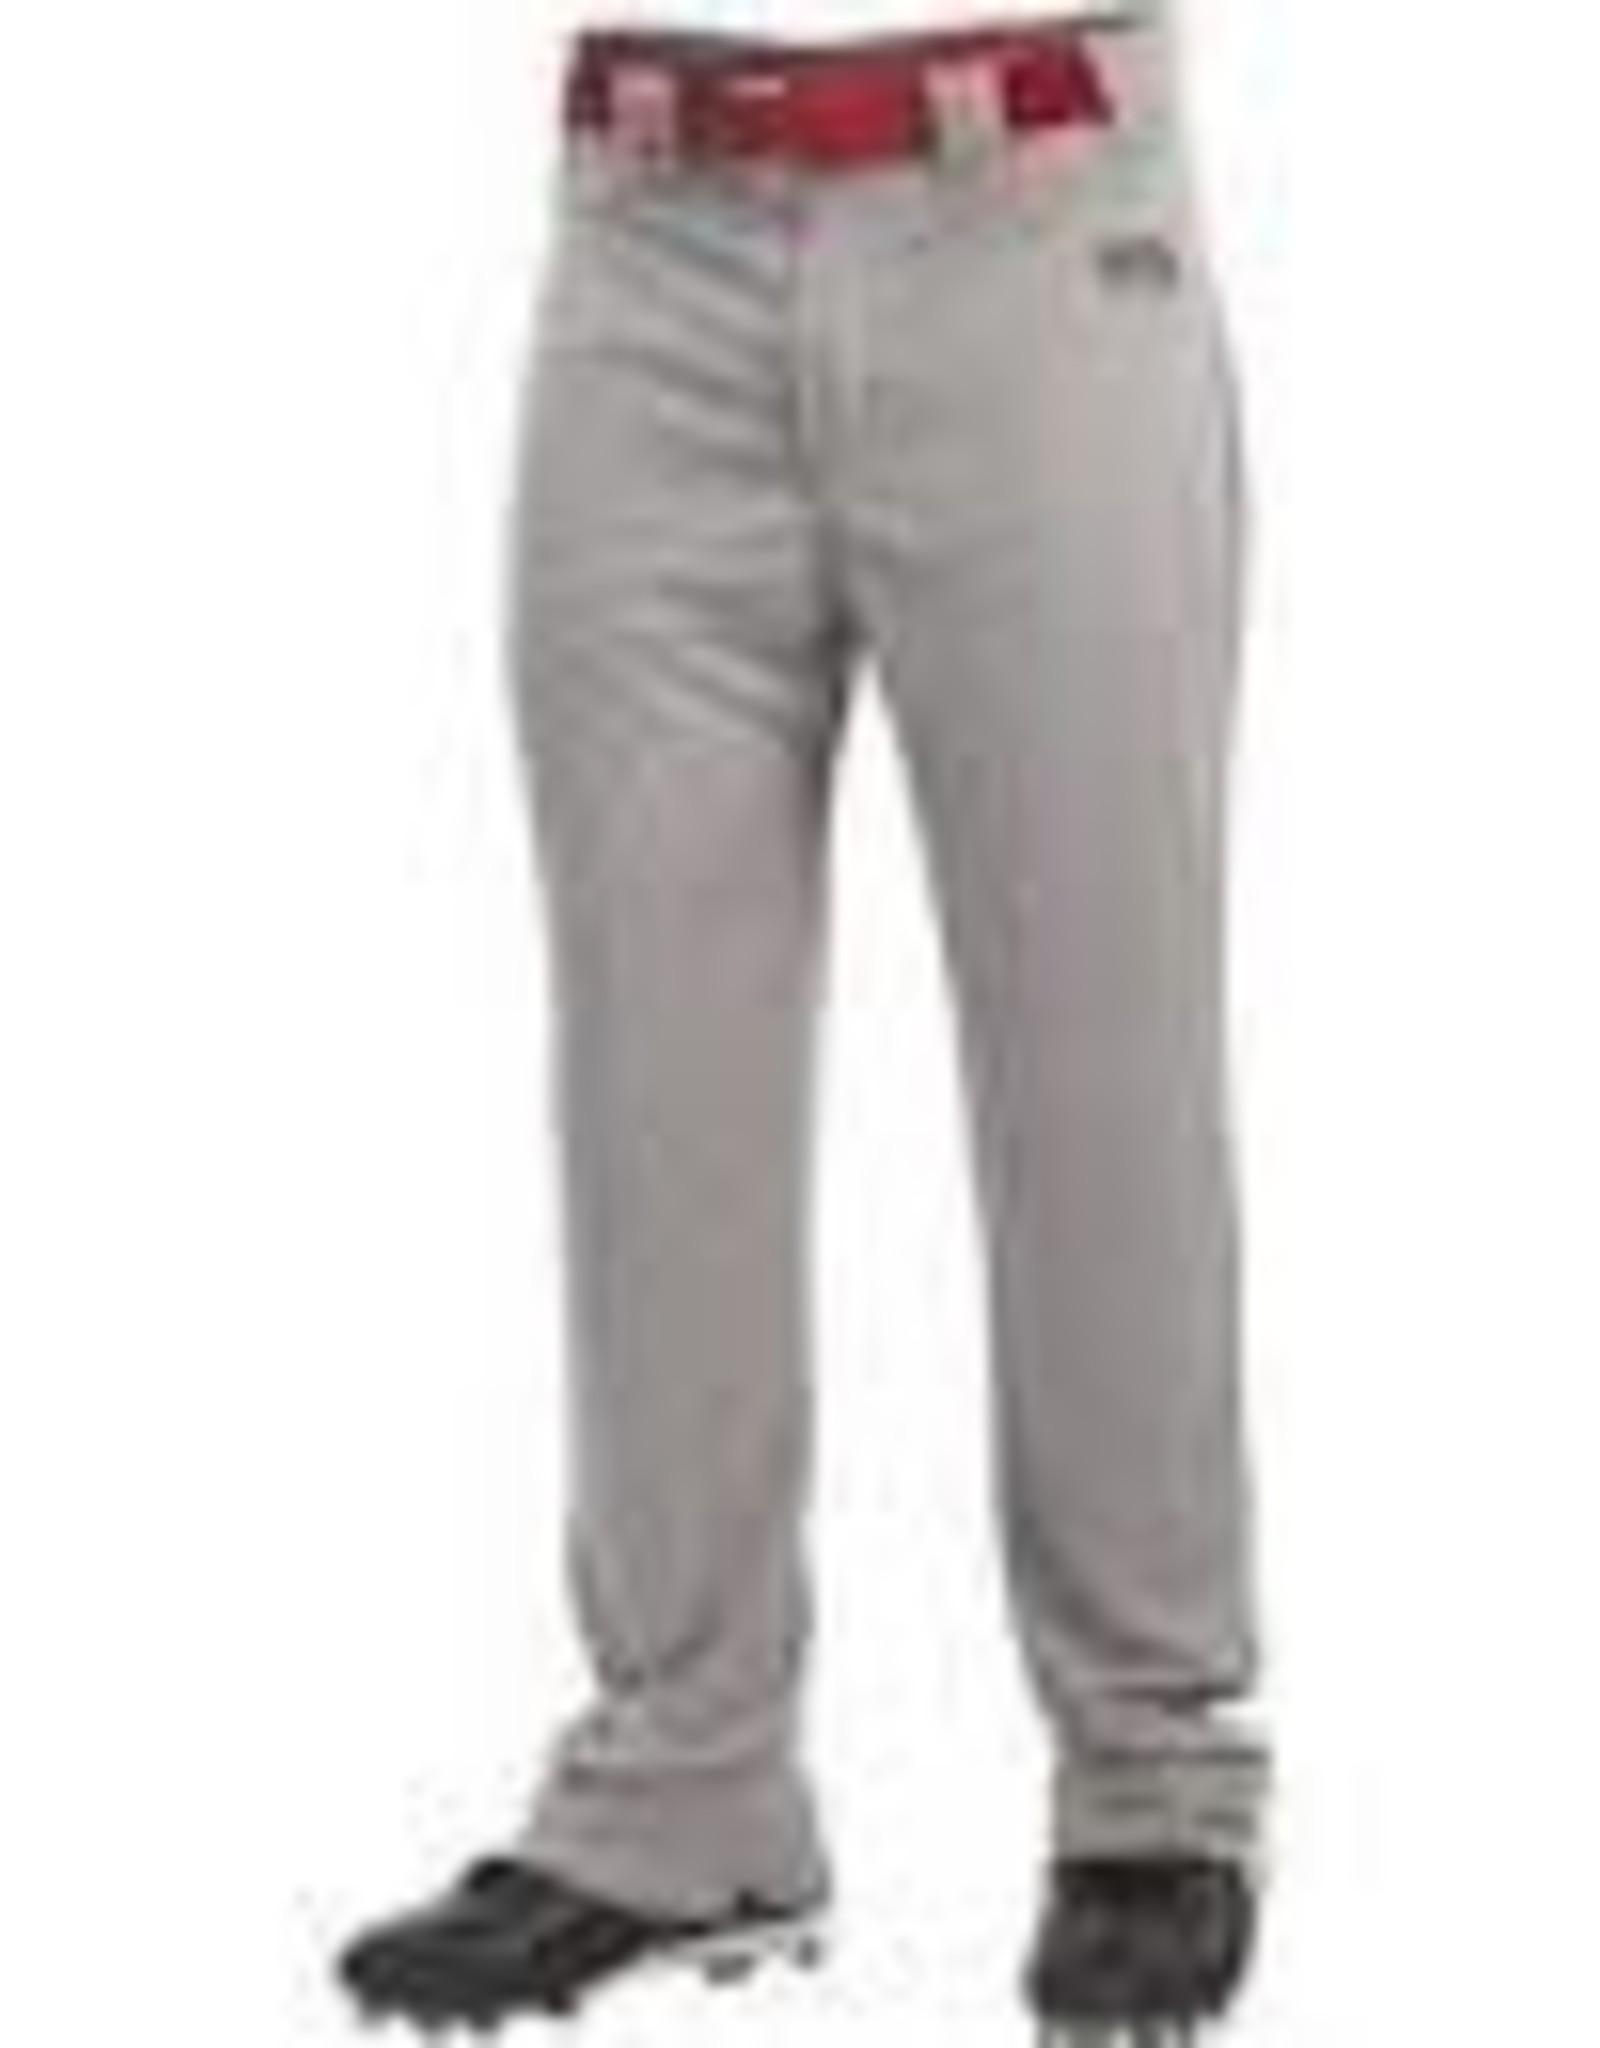 Rawlings youth rawlings pants gris pâle (L)